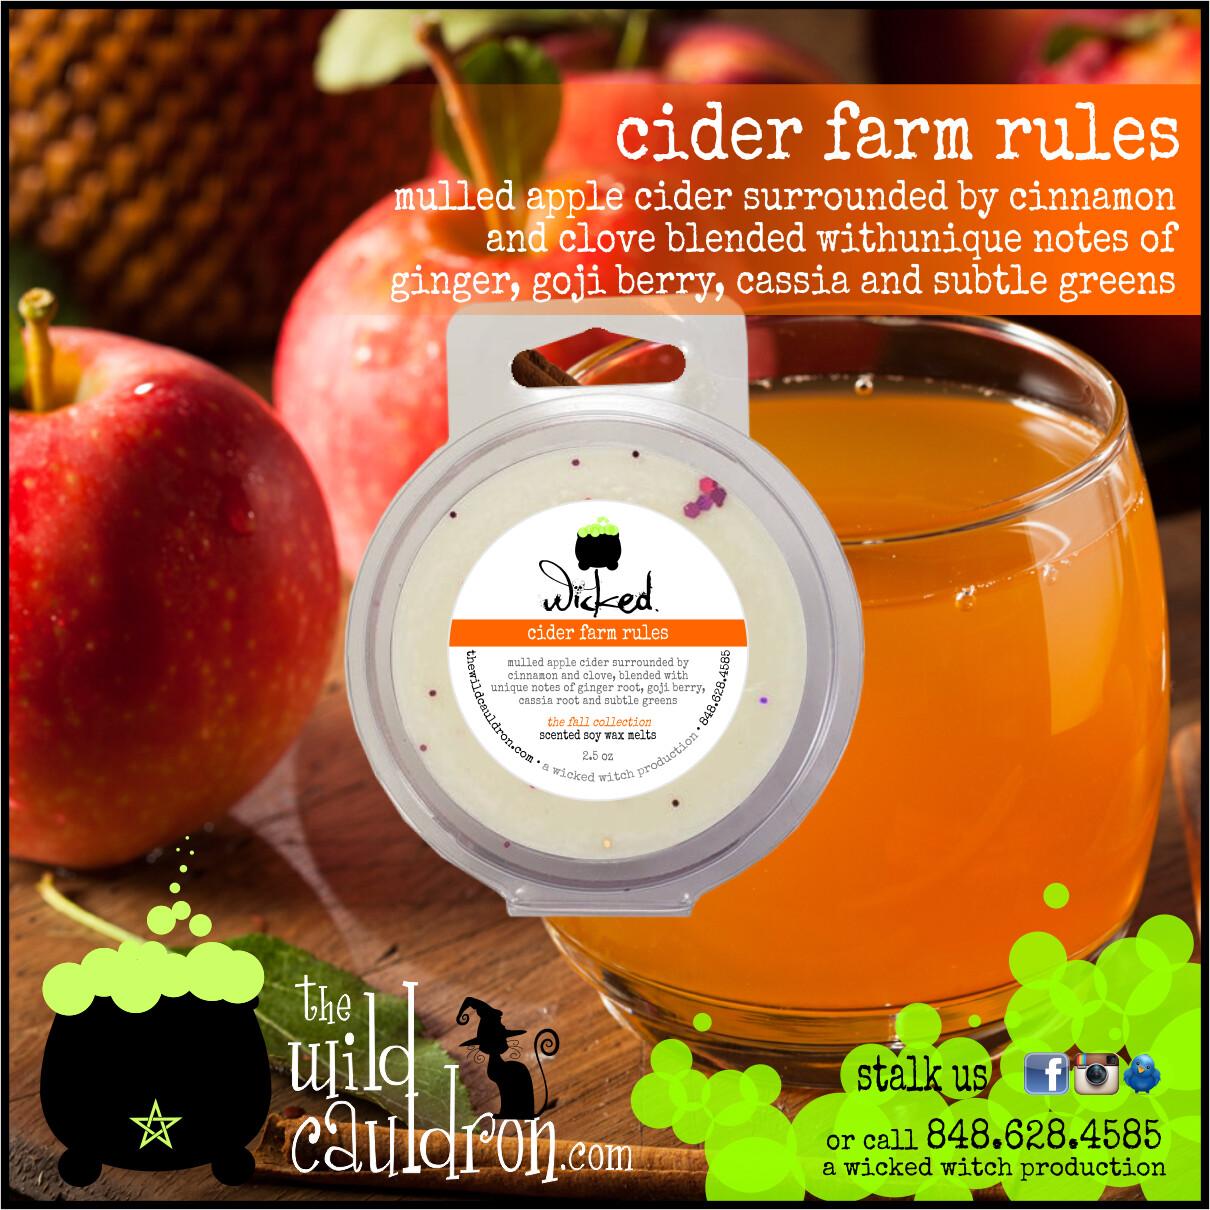 Cider Farm Rules